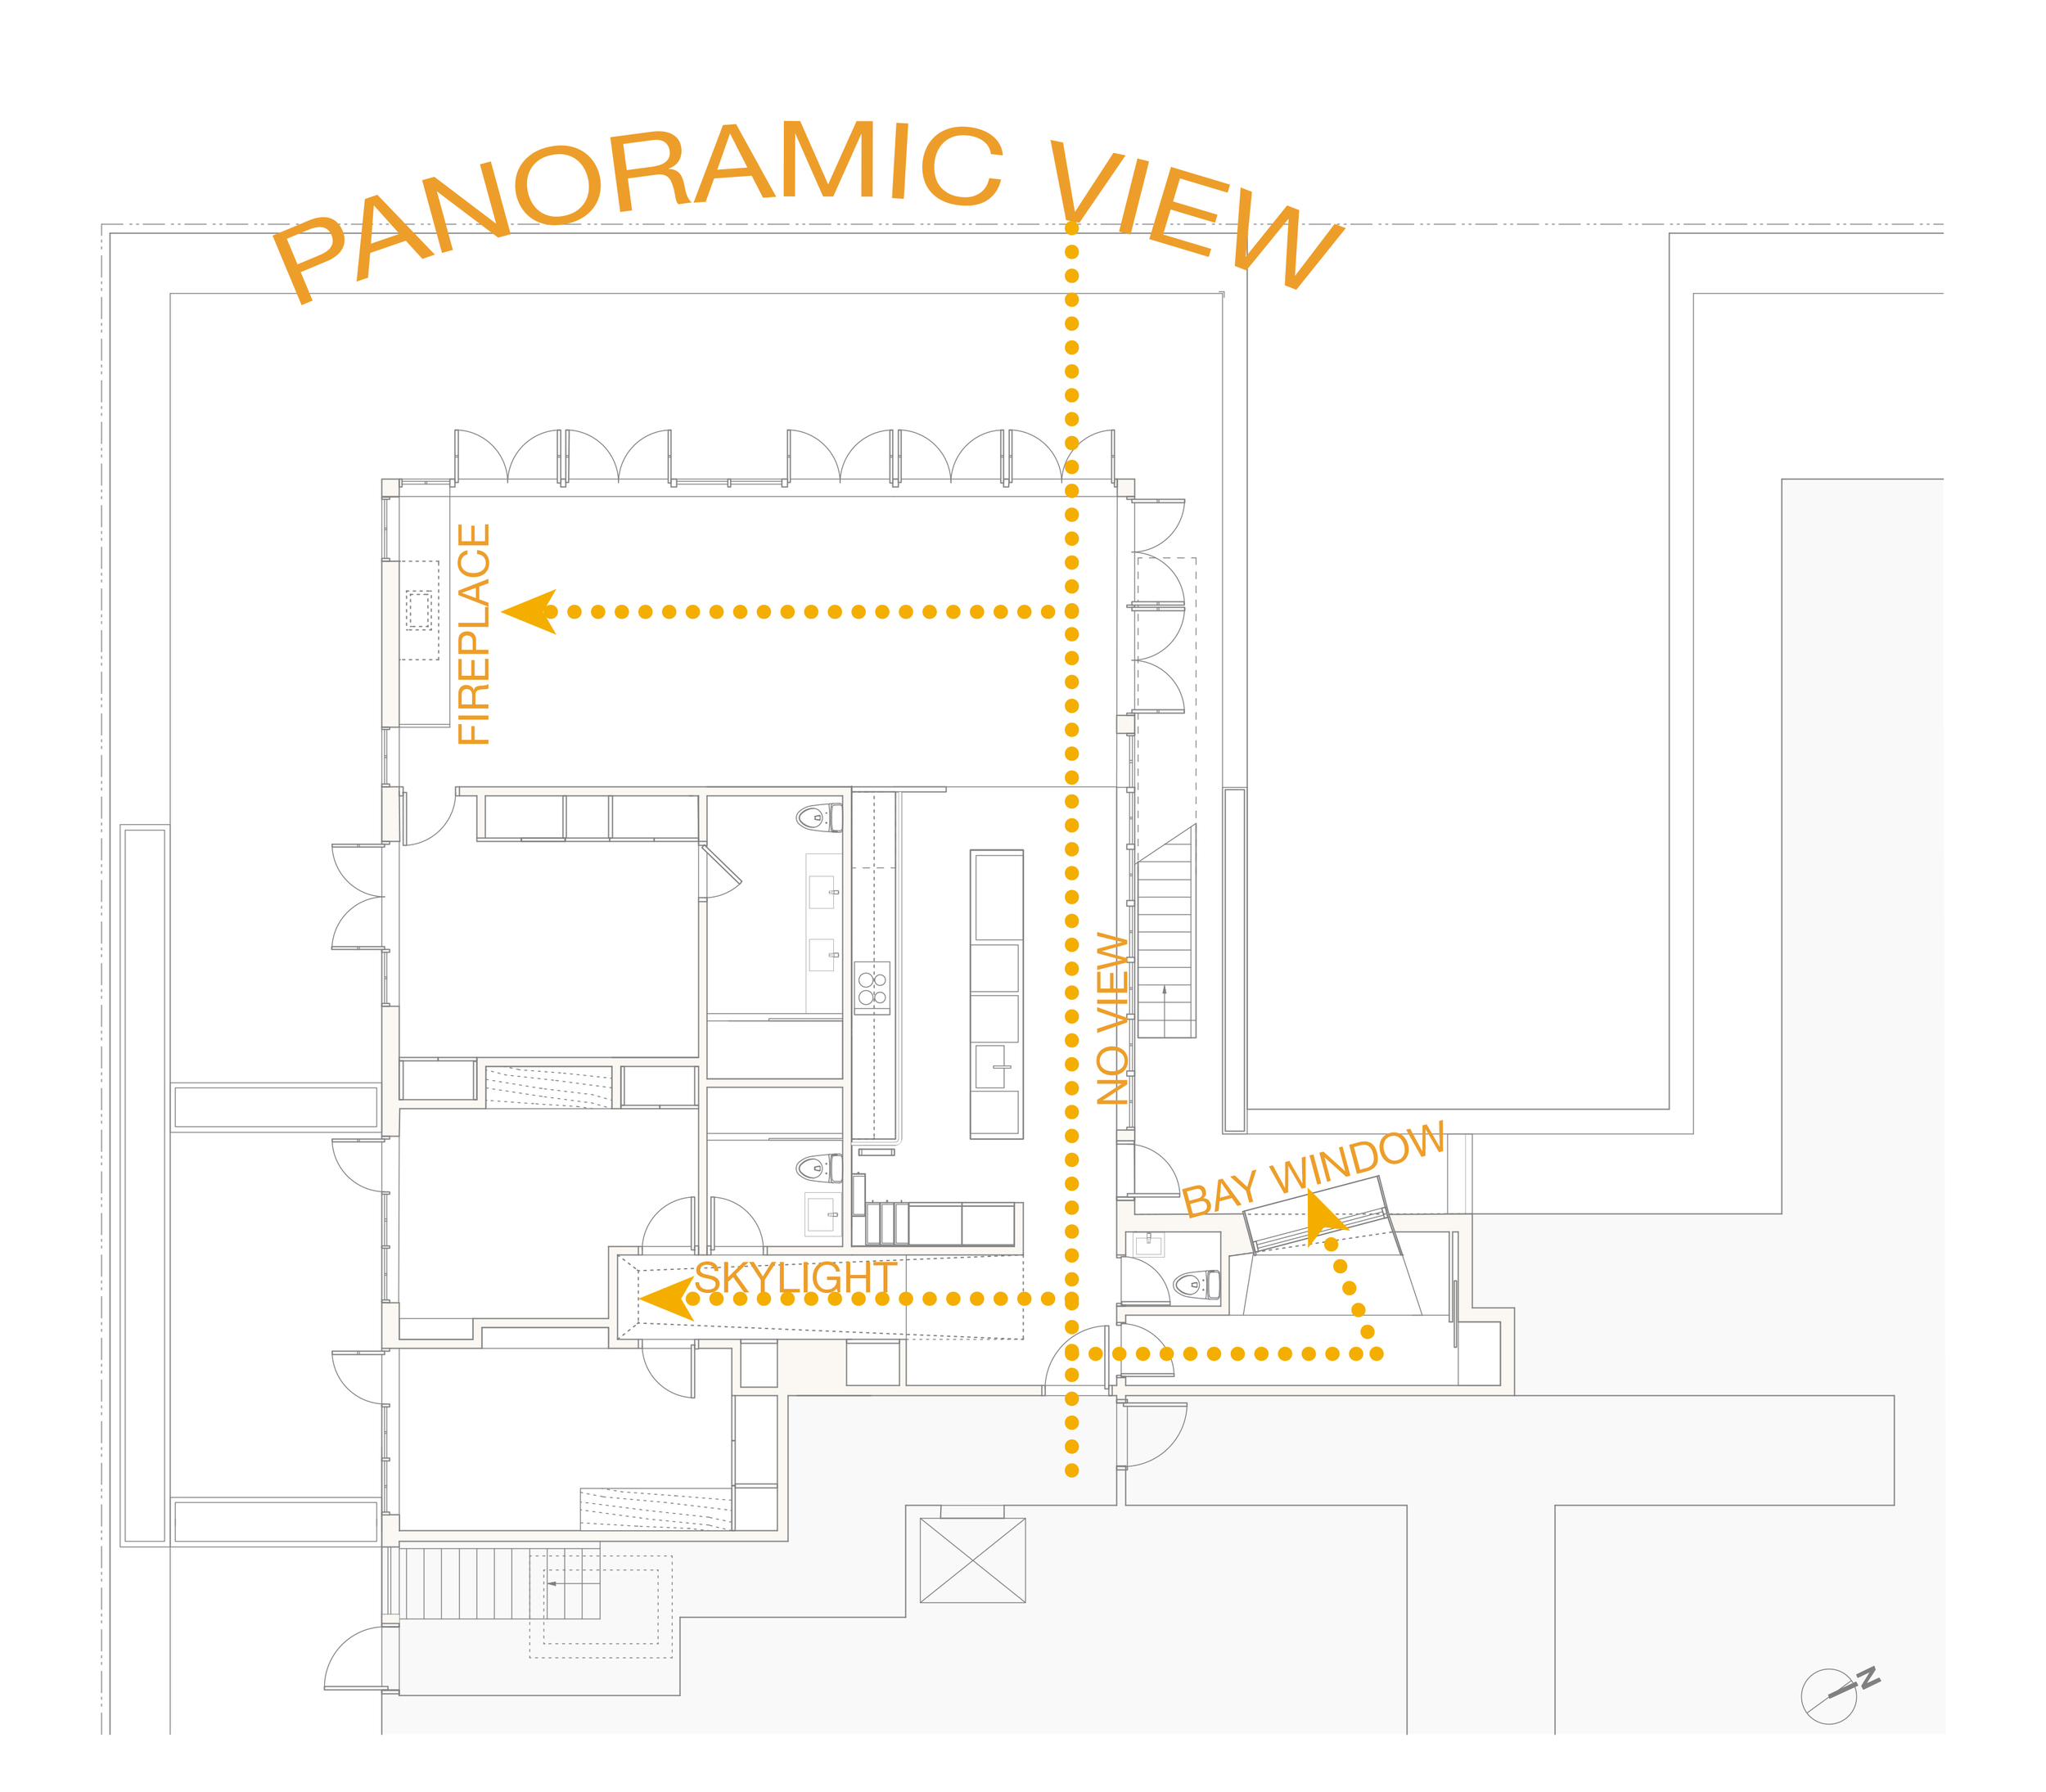 SK0-062515 Diagram.jpg